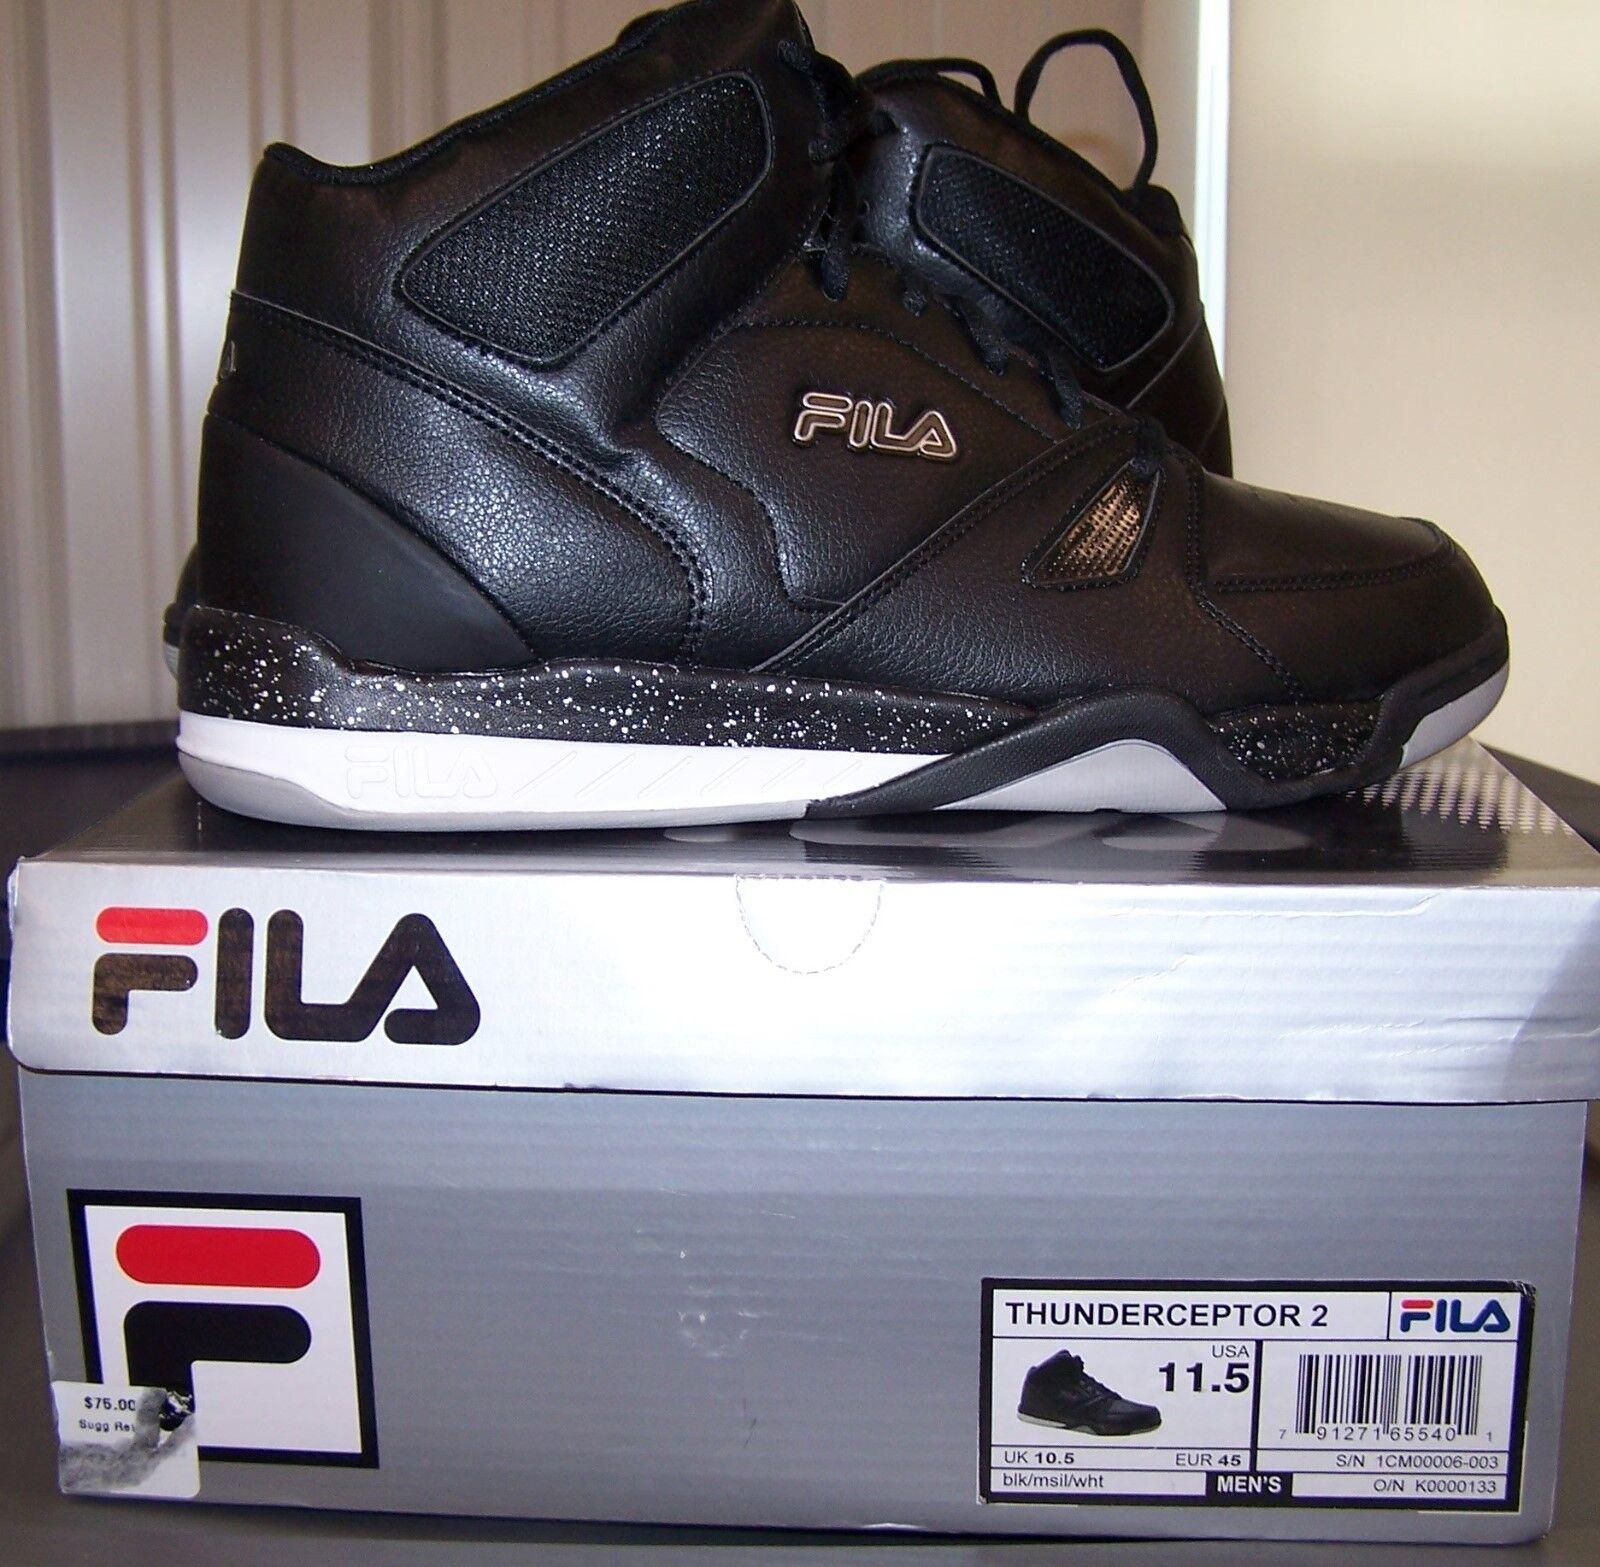 Baloncesto calzado Nuevo tenis fila Thunderceptor 2 Alta Nuevo calzado Negro Para Hombres 9.5 11.5 372222